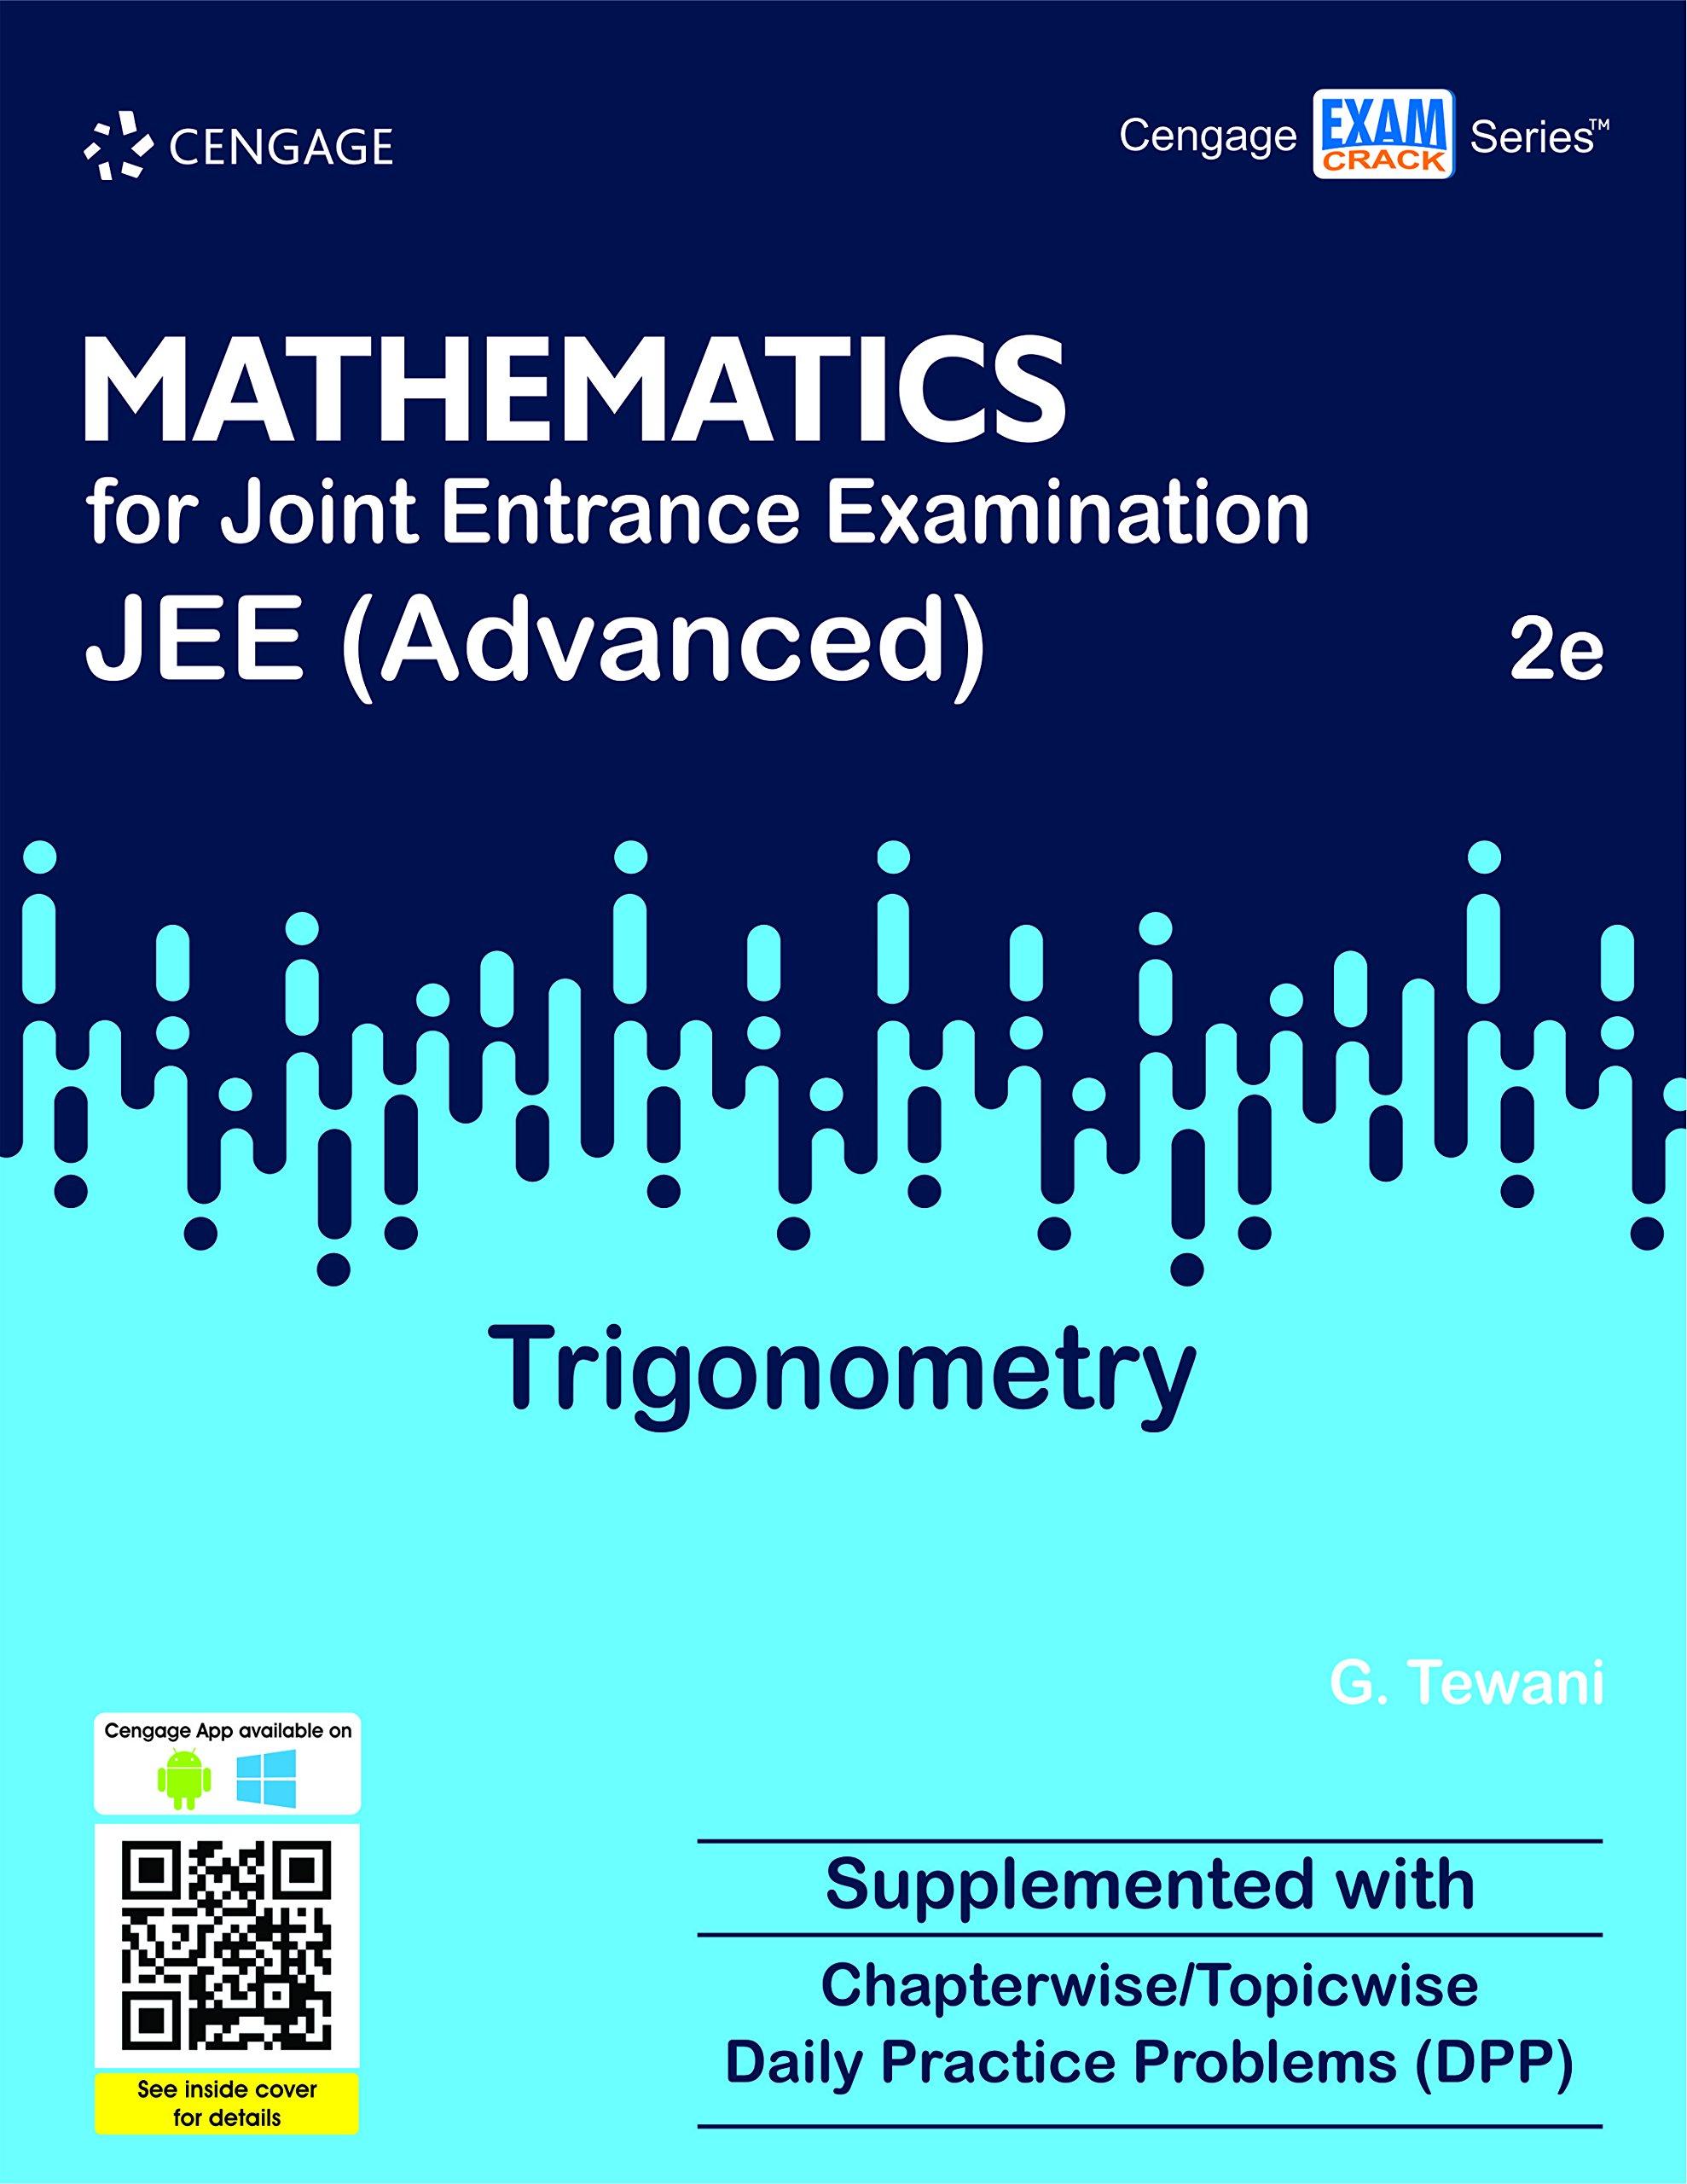 Mathematics for Joint Entrance Examination JEE Advanced